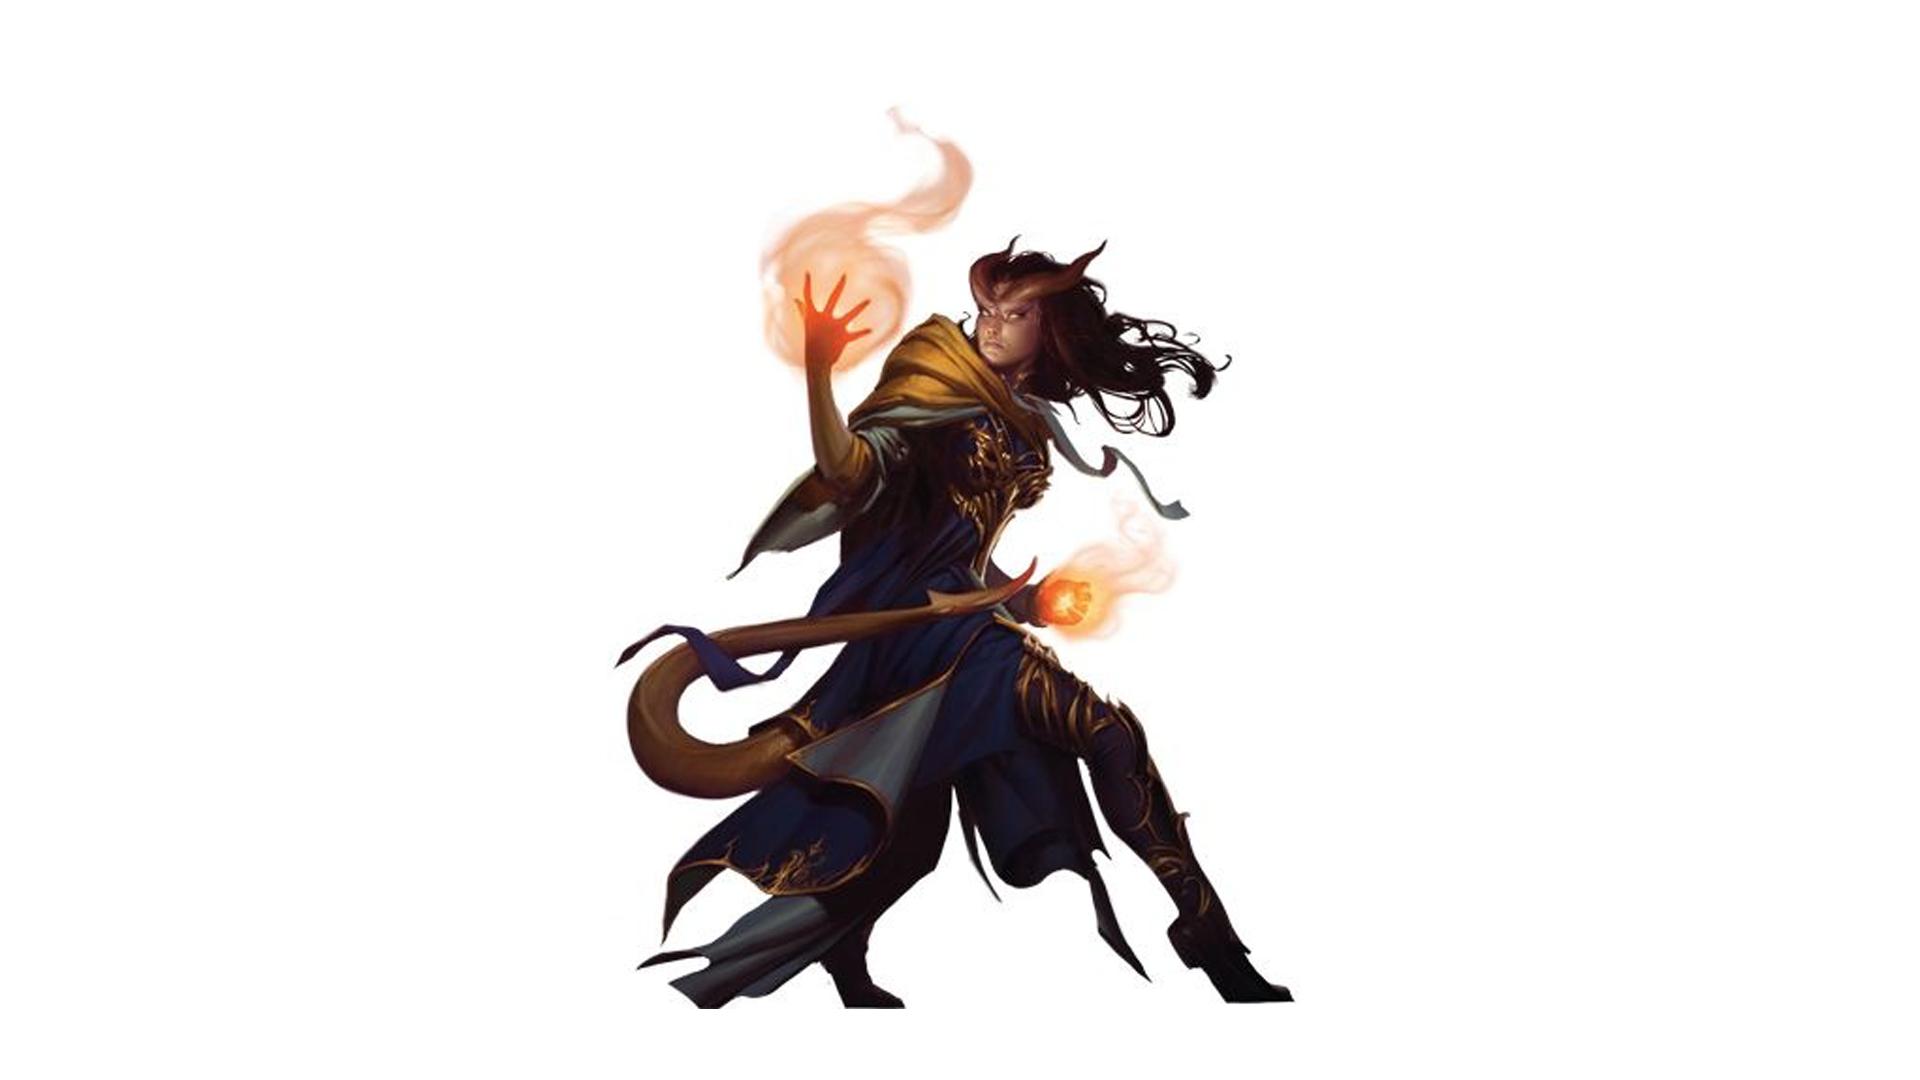 Tiefling Warlock holding a flame